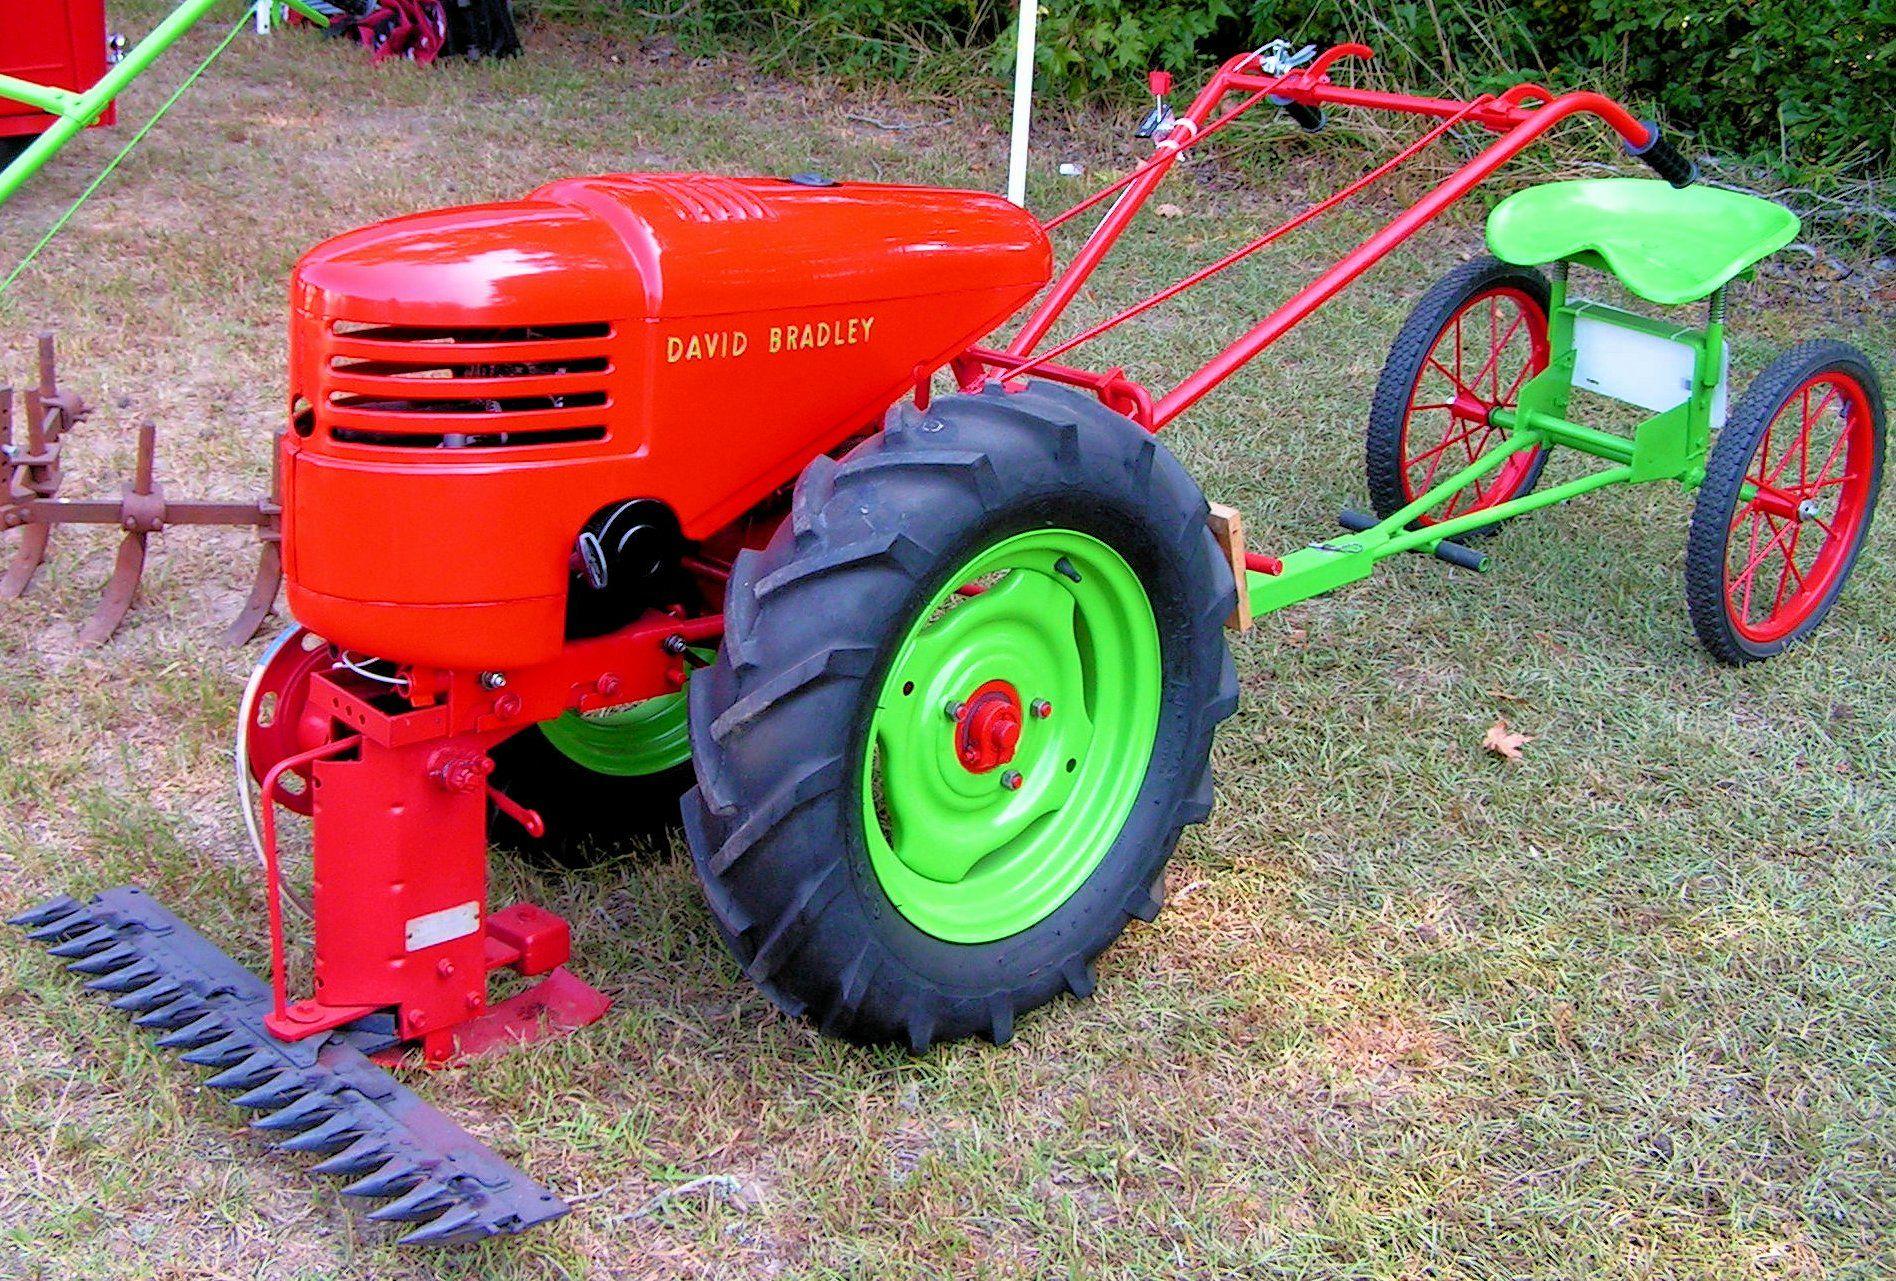 David Bradley Tractor Inman Heritage Days Inman Ga Sep2010 Old Tractors Pinterest